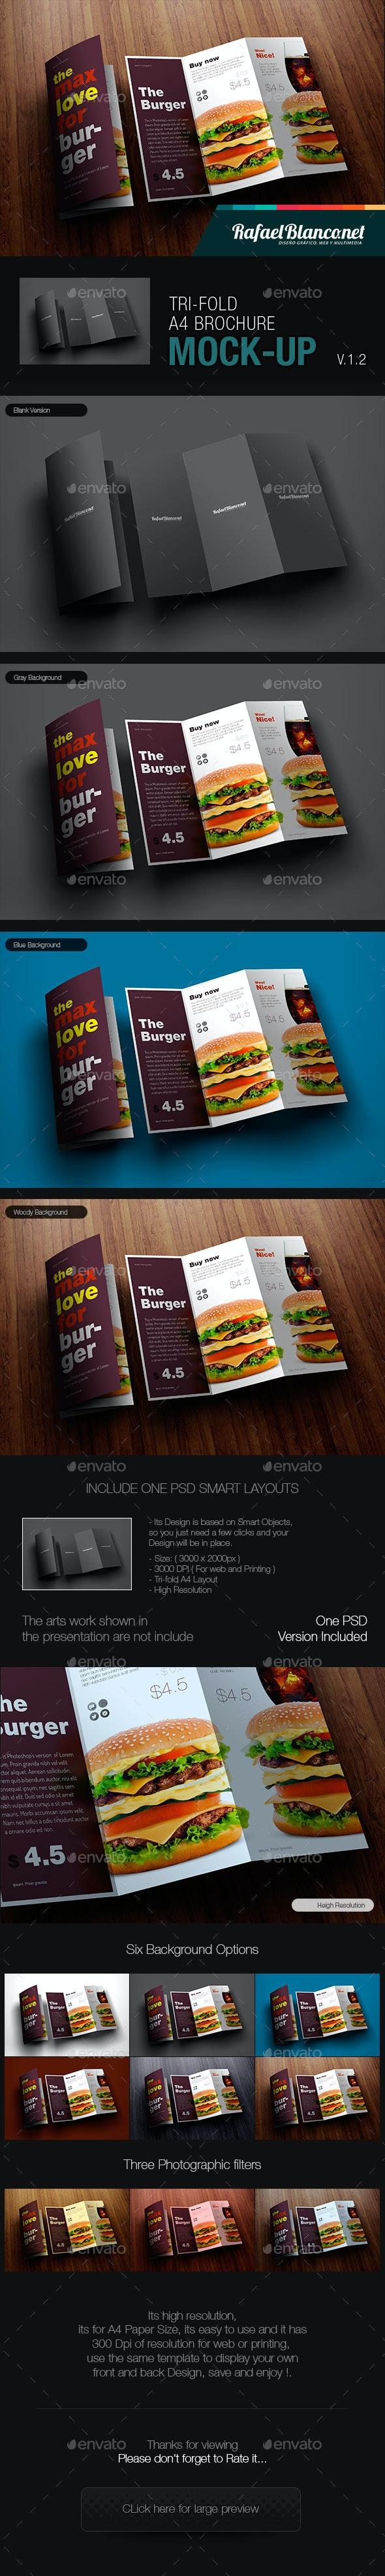 Tri-Fold A4 Brochure Mock-Up - Product Mock-Ups Graphics